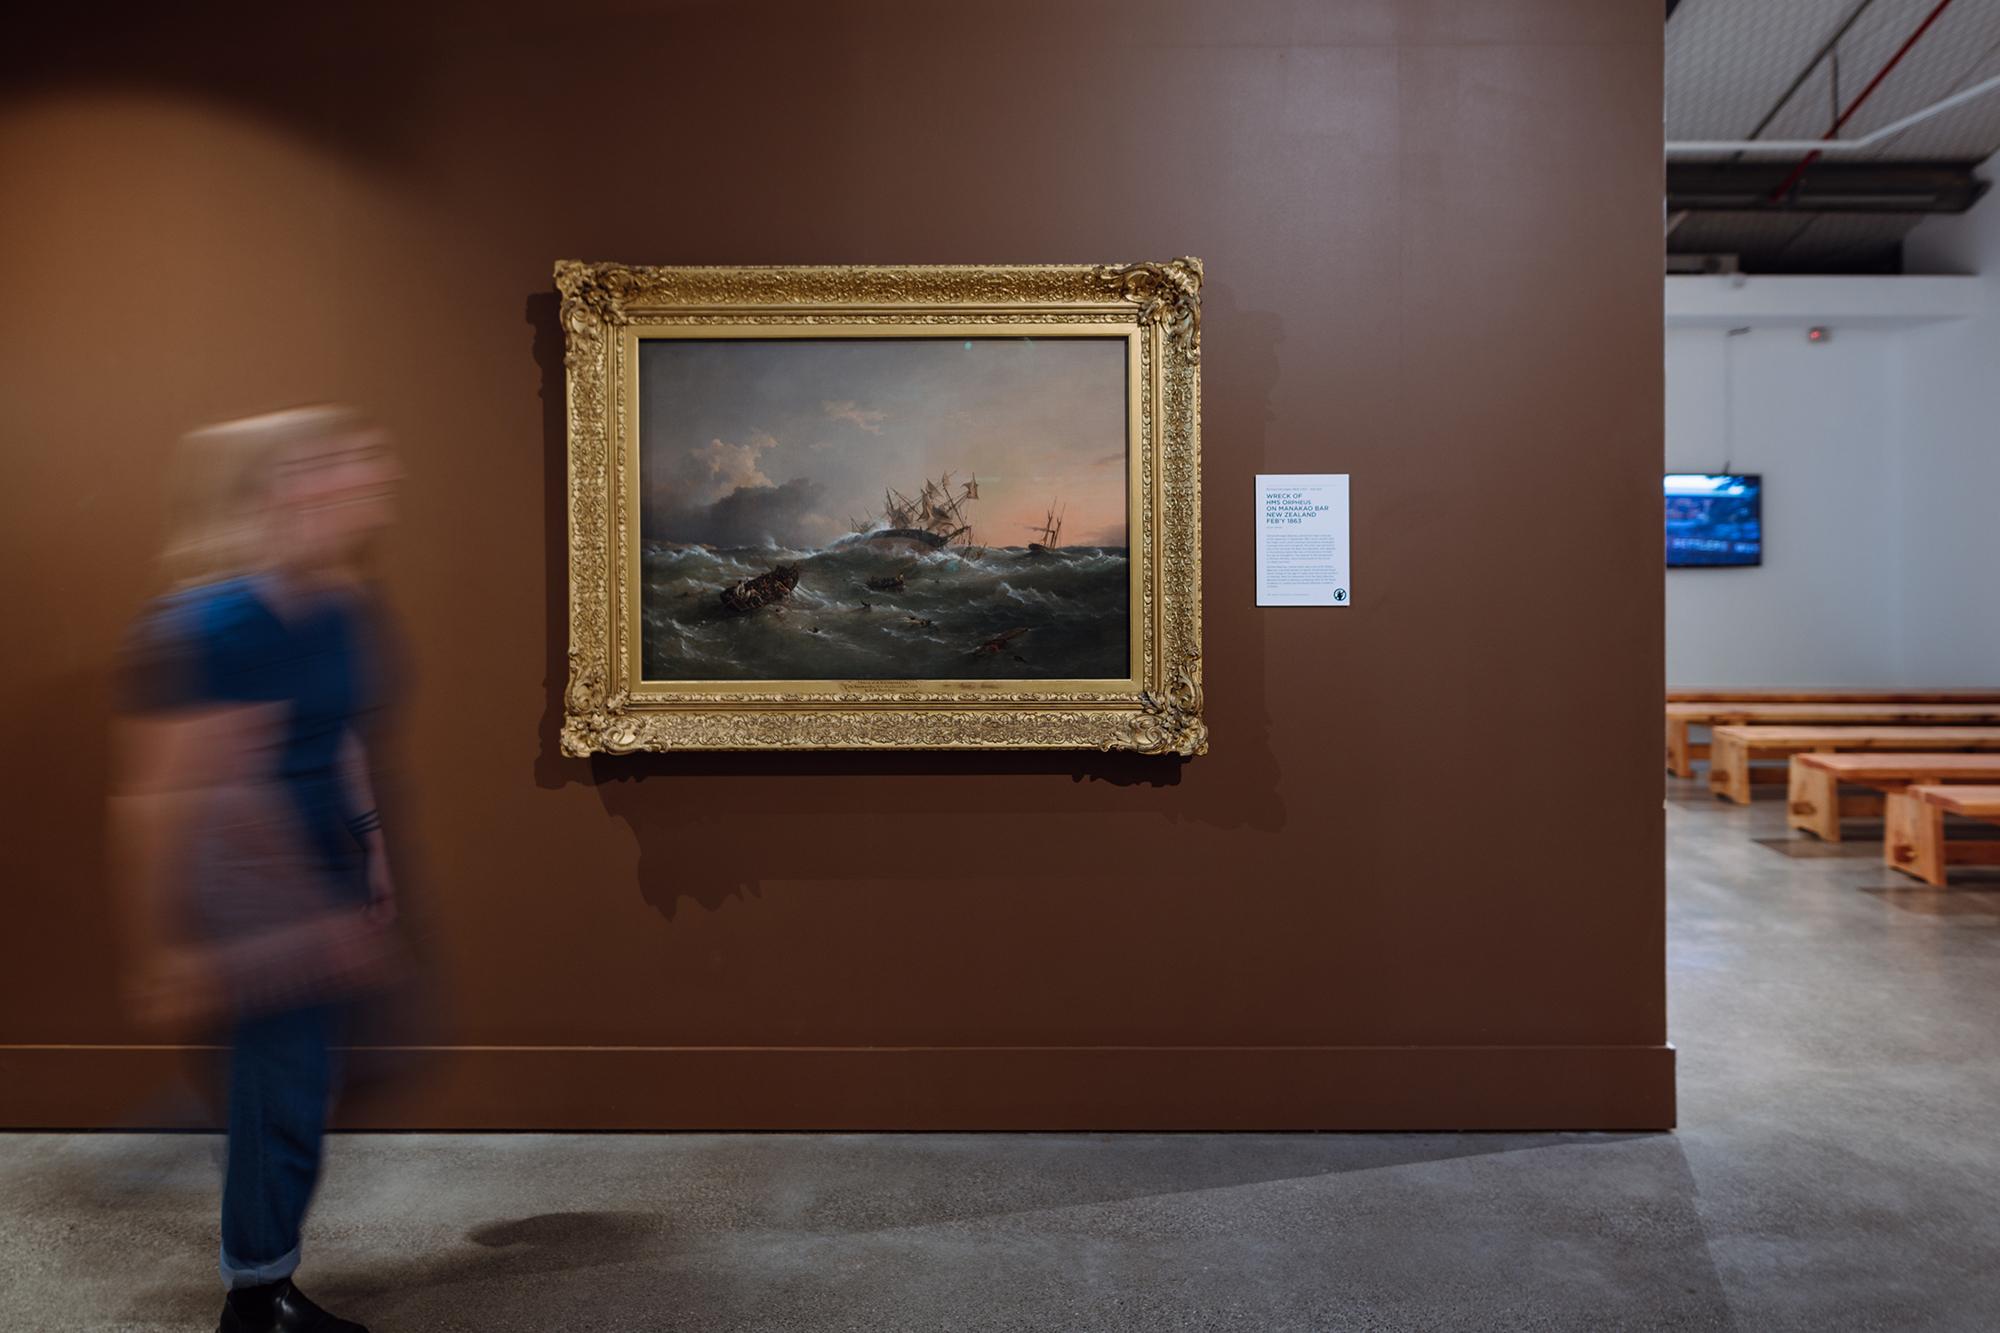 https://rfacdn.nz/maritime/assets/media/orpheous-edmiston-gallery-carousel.jpg